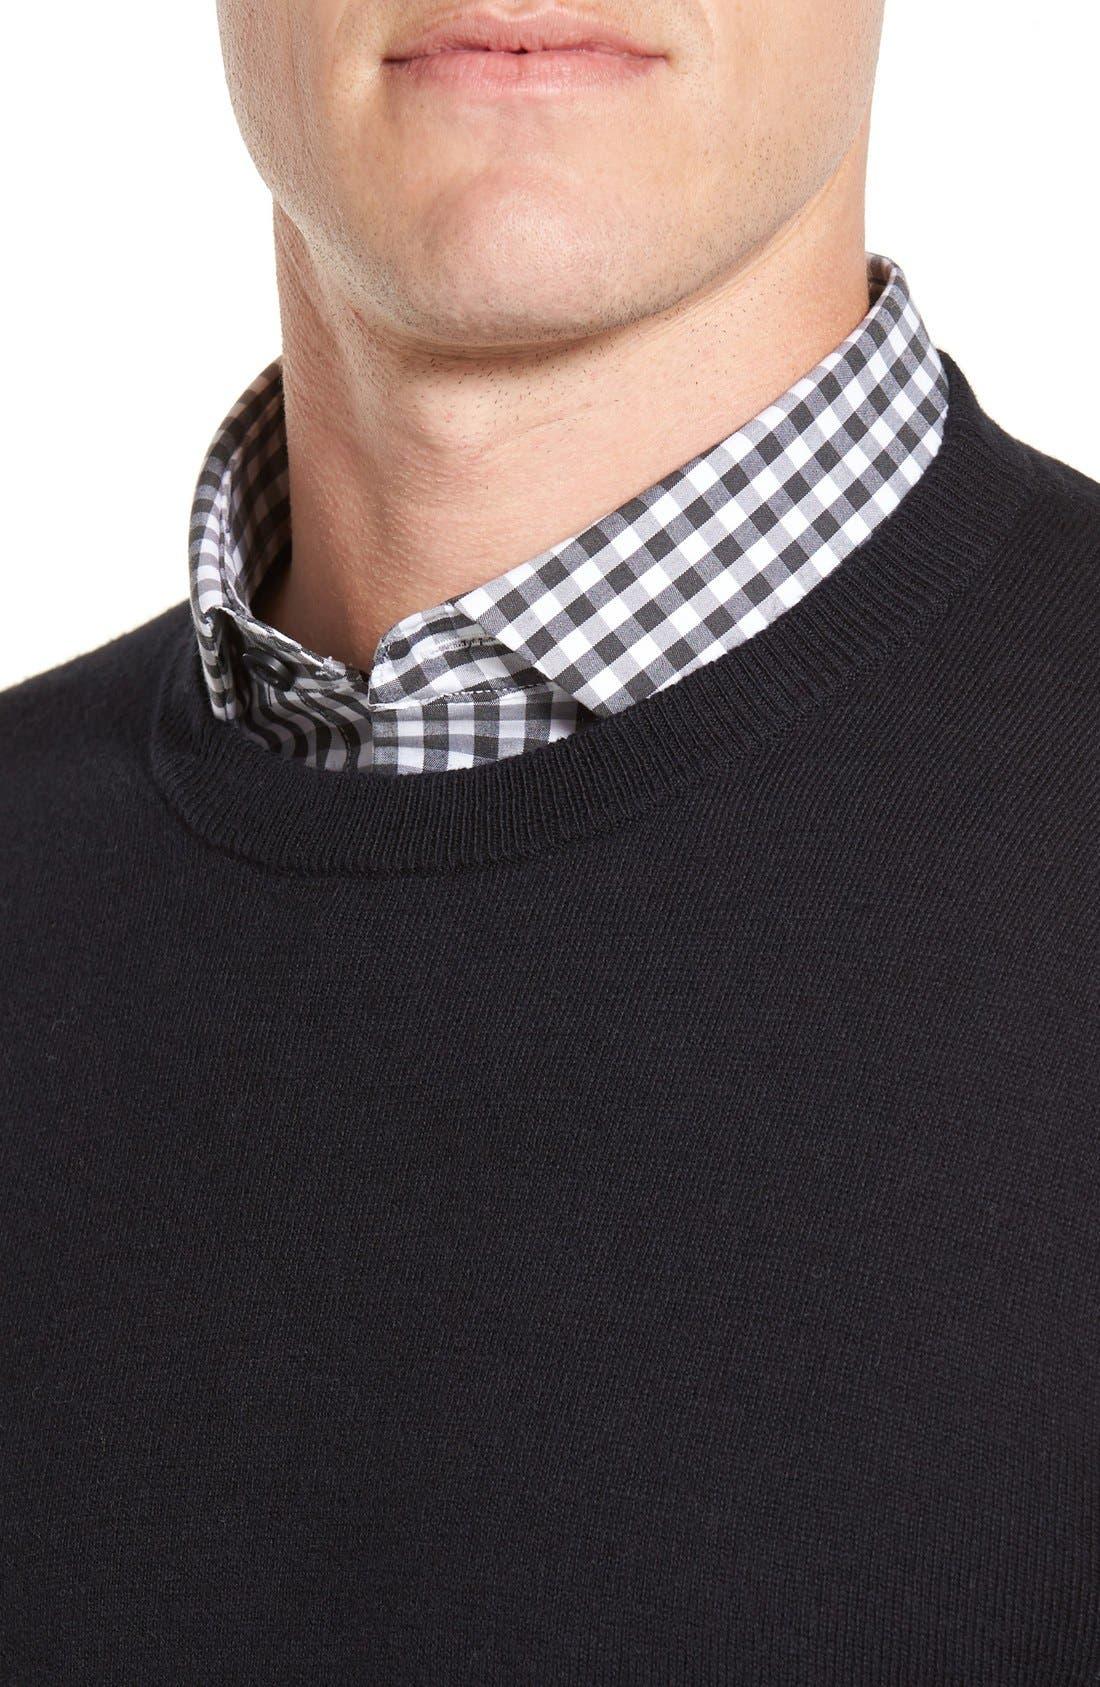 Cotton & Cashmere Crewneck Sweater,                             Alternate thumbnail 4, color,                             Black Caviar